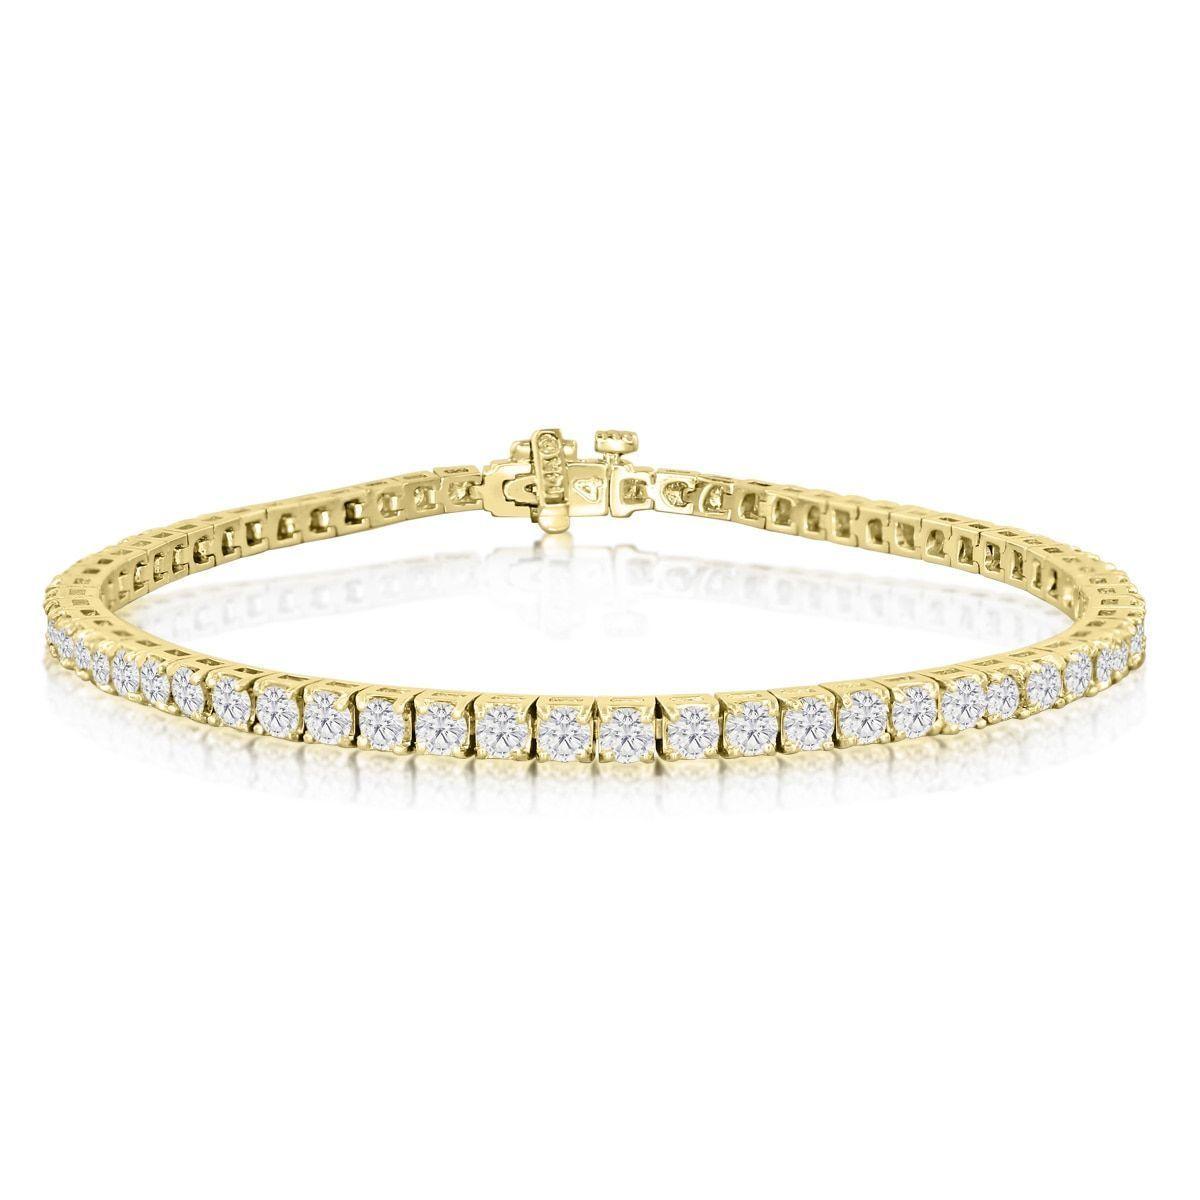 14k Yellow Gold 4 Carat Diamond Tennis Bracelet J K I2 I3 9 Inch Women S White J K Solid Dazzling Jewelry Diamond Bracelets Diamond Bracelets